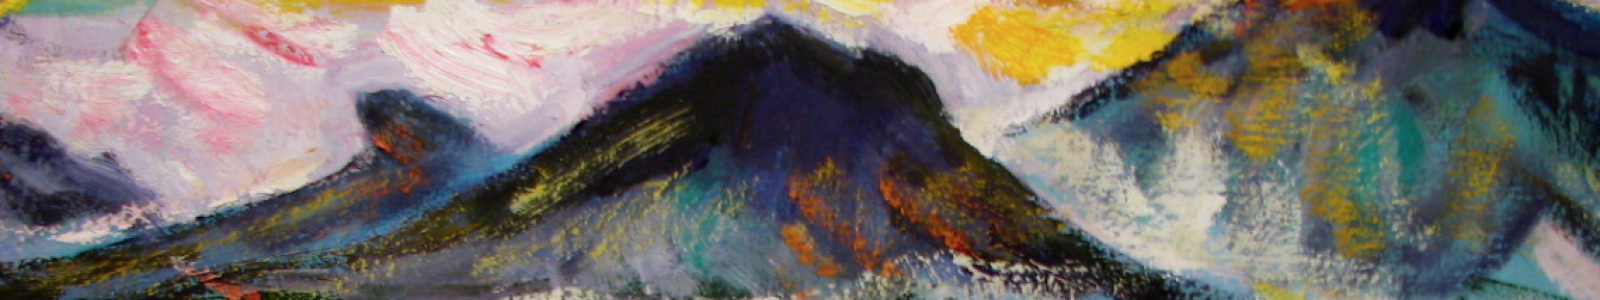 Gallery Painter Oleg Chernov